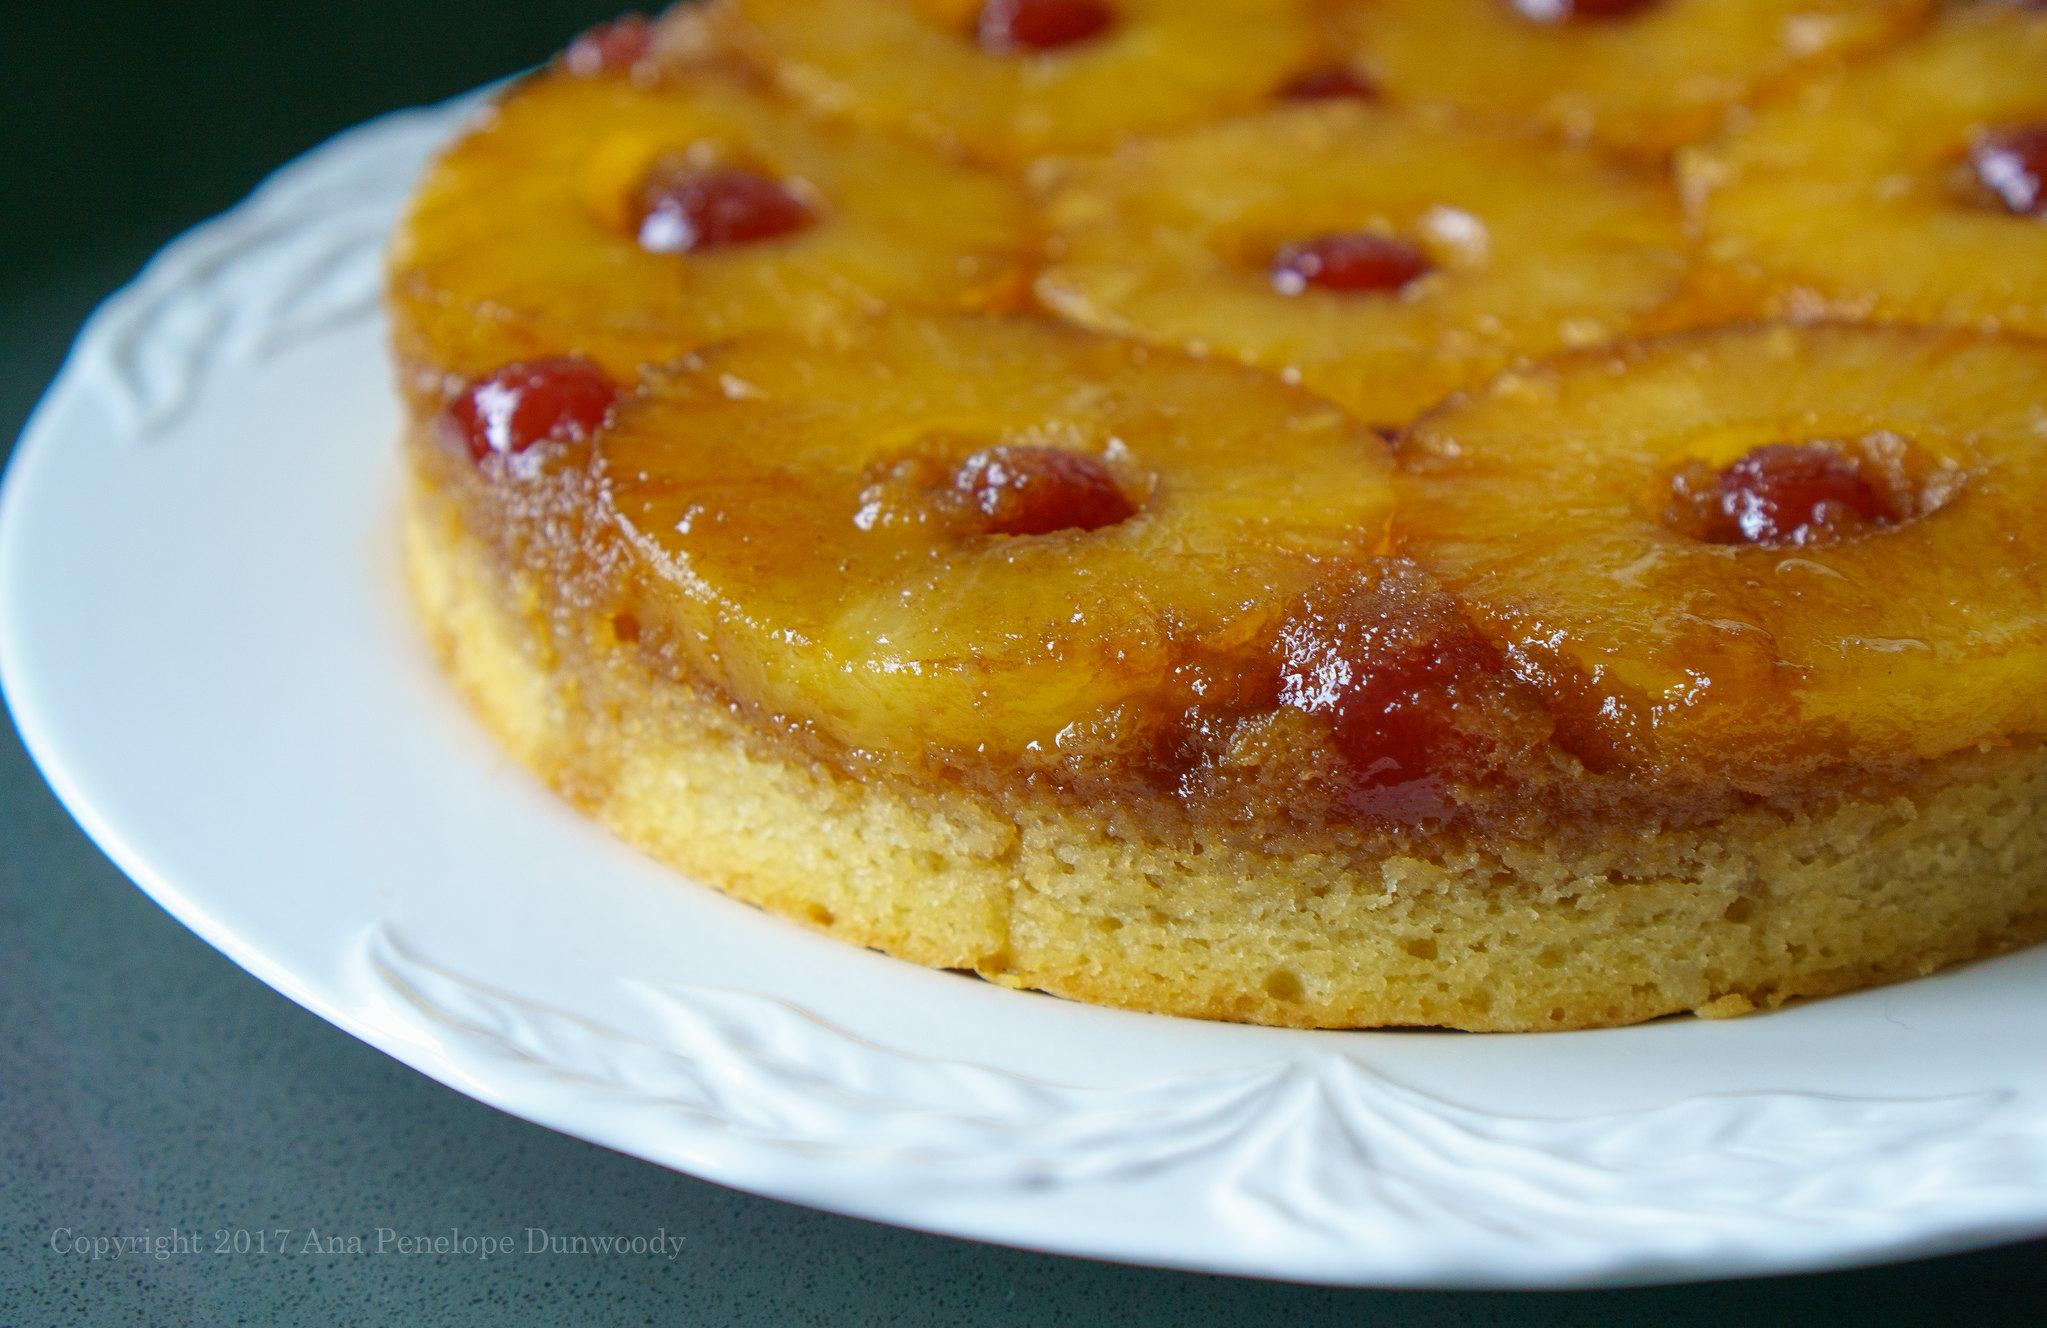 Pineapple Upside Down Cake #2